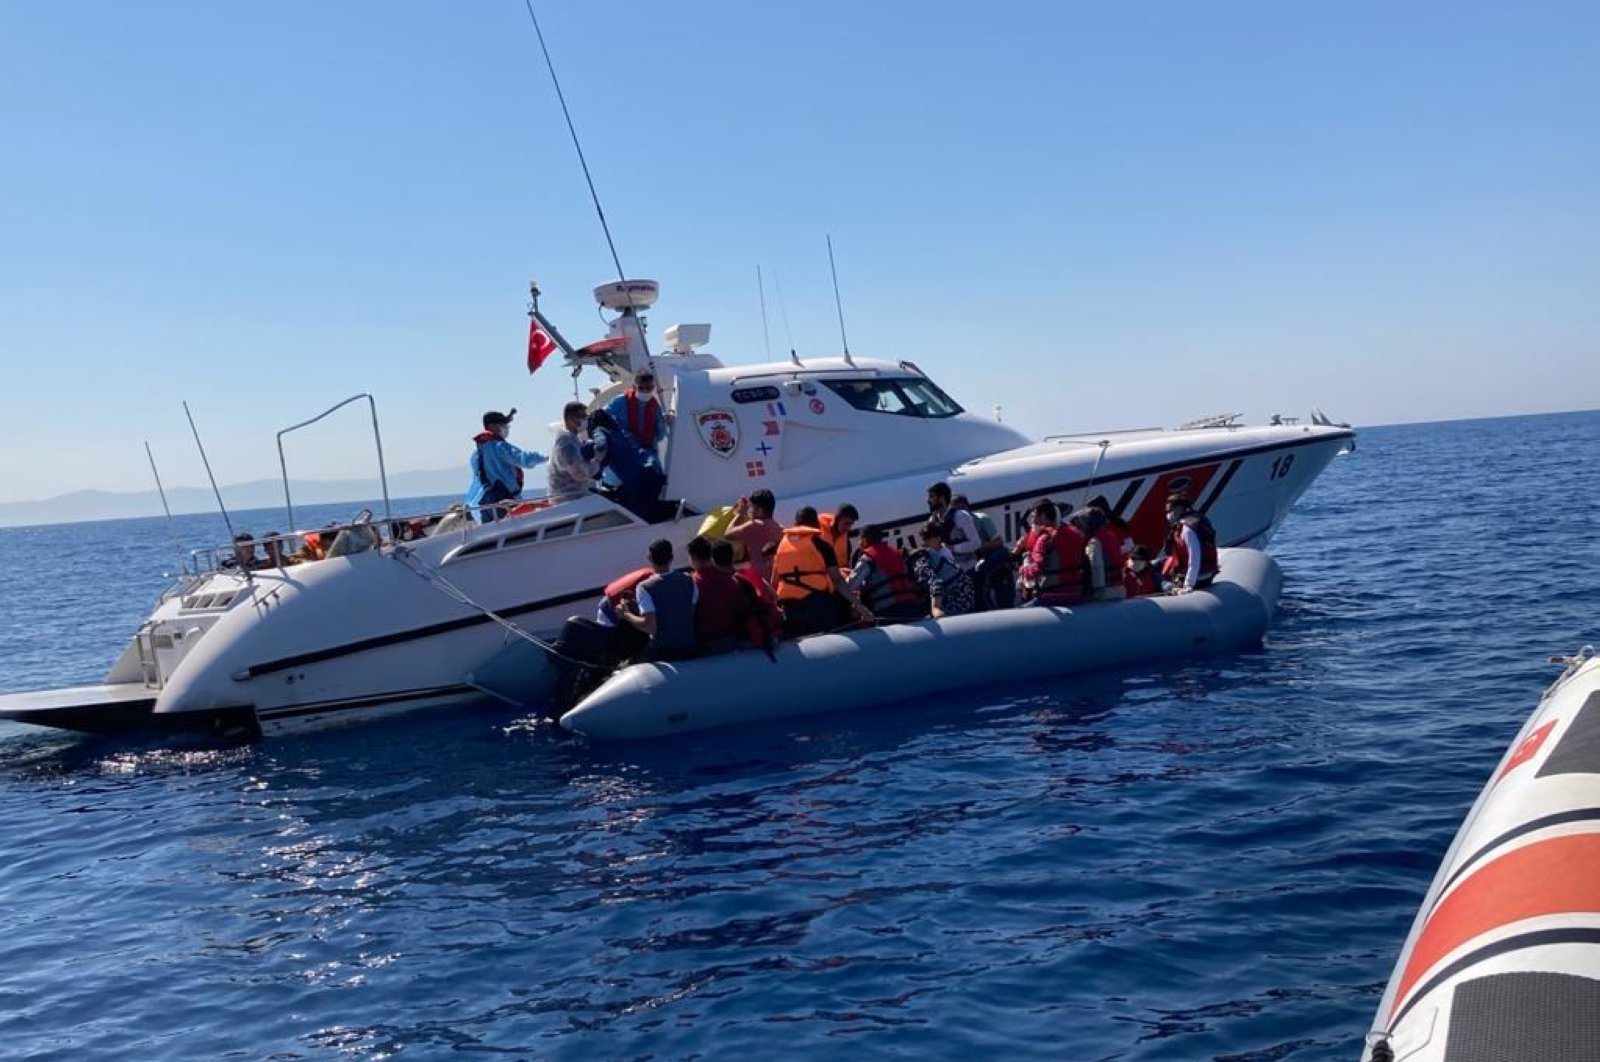 The Turkish coast guard saves the migrants in the Aegean Sea, July 21, 2020. (DHA Photo)